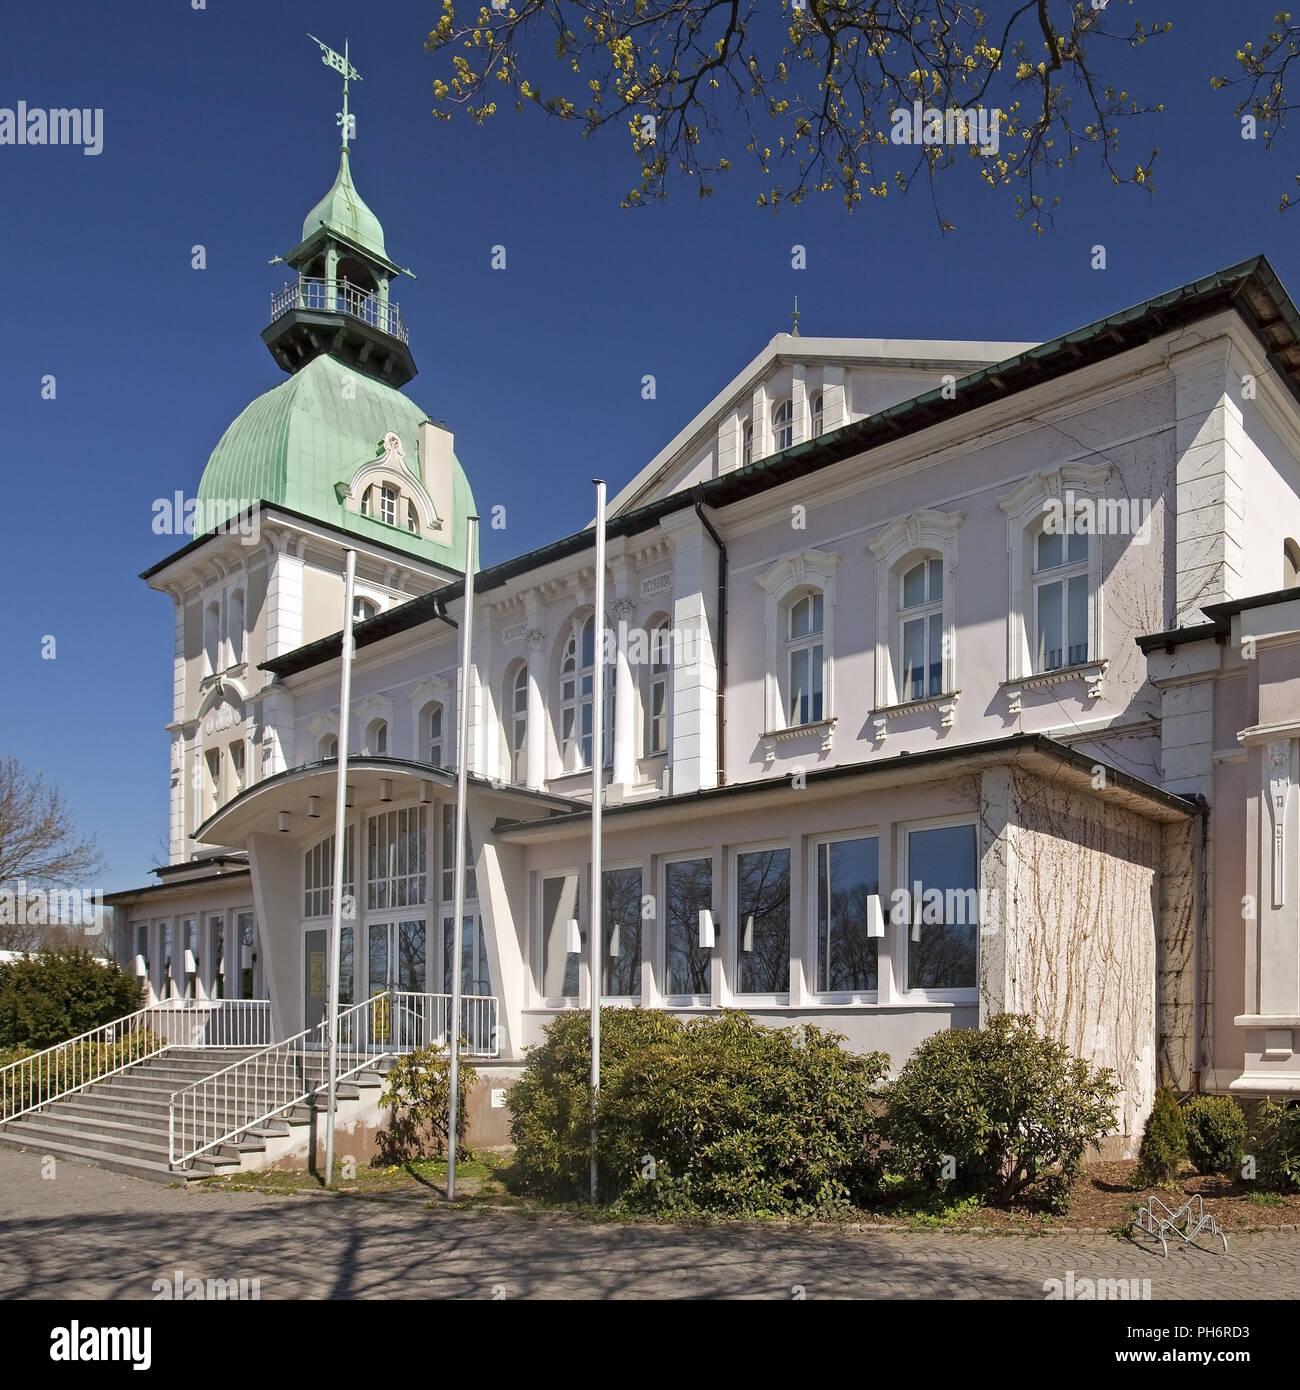 Club de tiro hall, Luedenscheid, Alemania Imagen De Stock